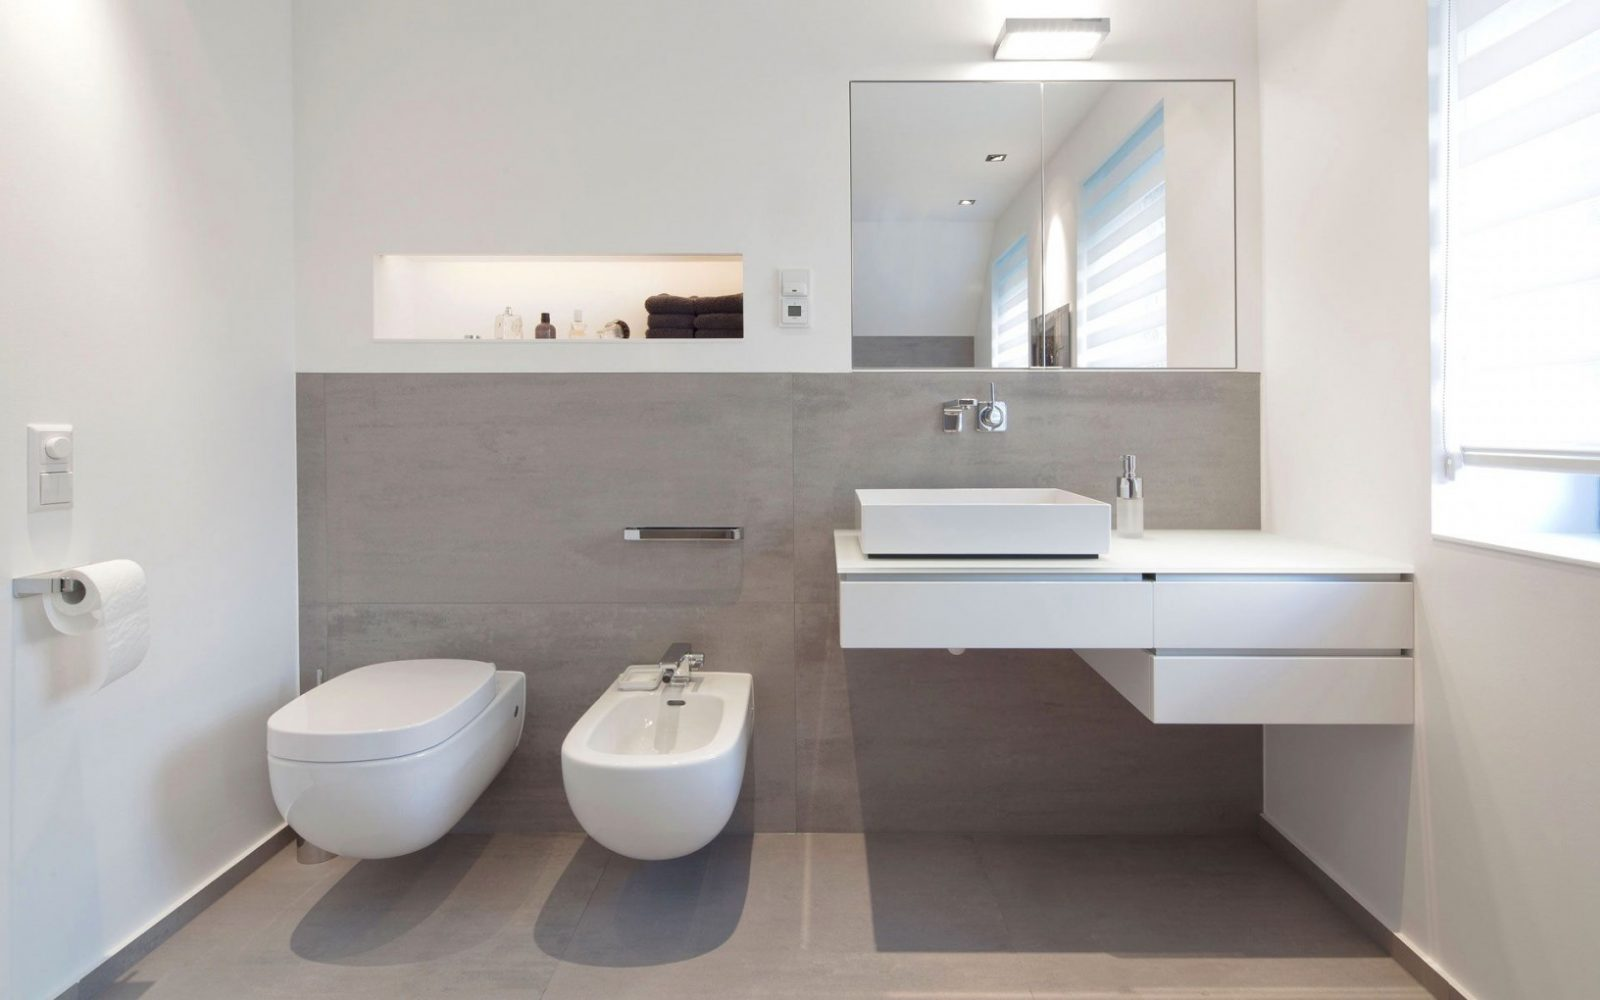 Badezimmer Ideen Fernen Verführerisch Moderne Badezimmer von Moderne Badezimmer Fliesen Photo